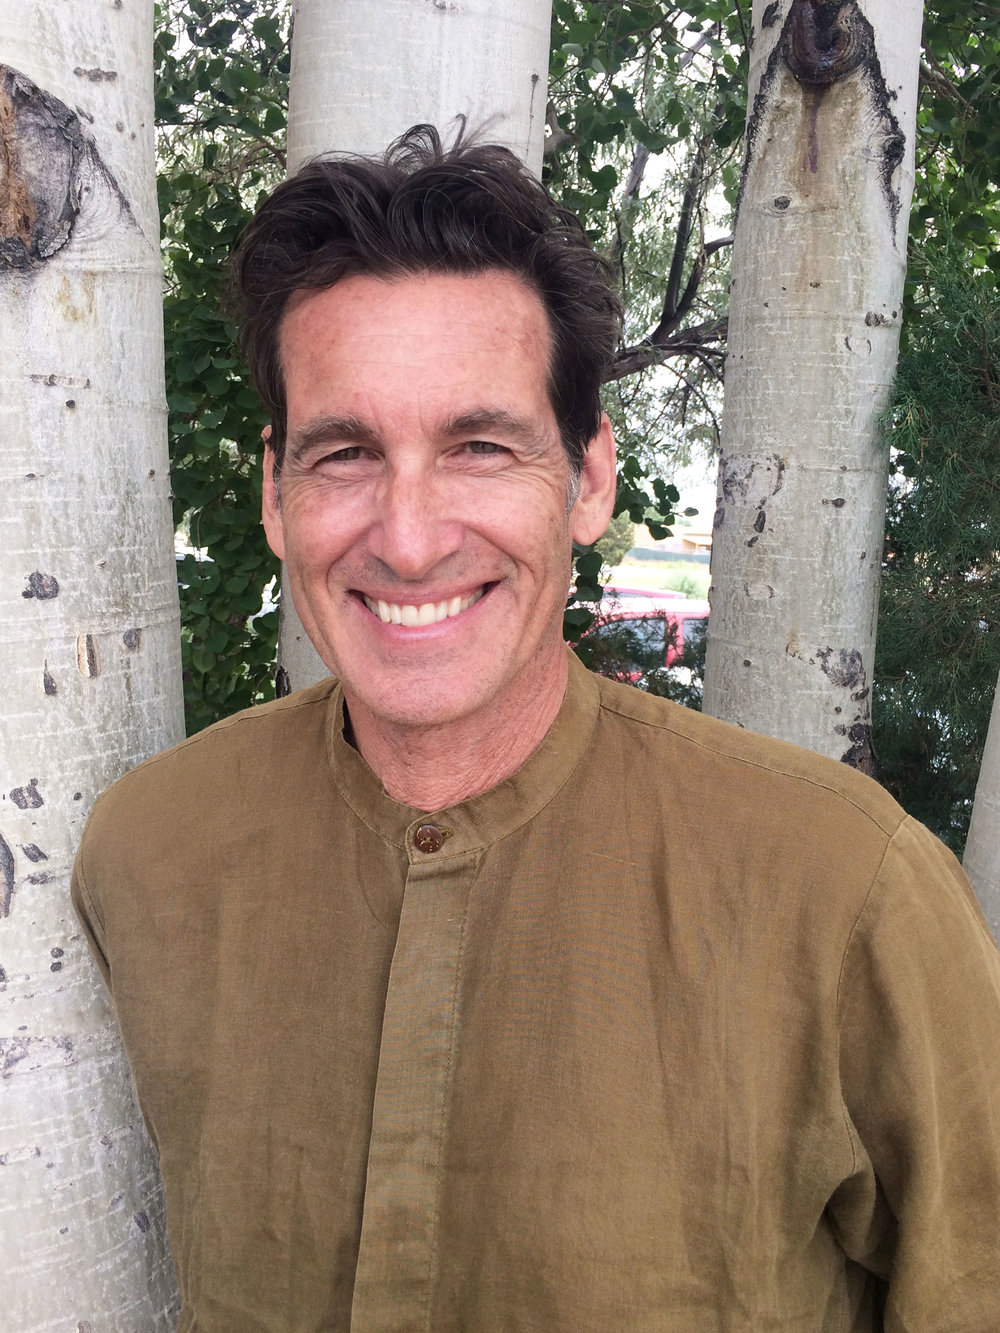 Taos Whole Health Integrative Care - Bill Curry